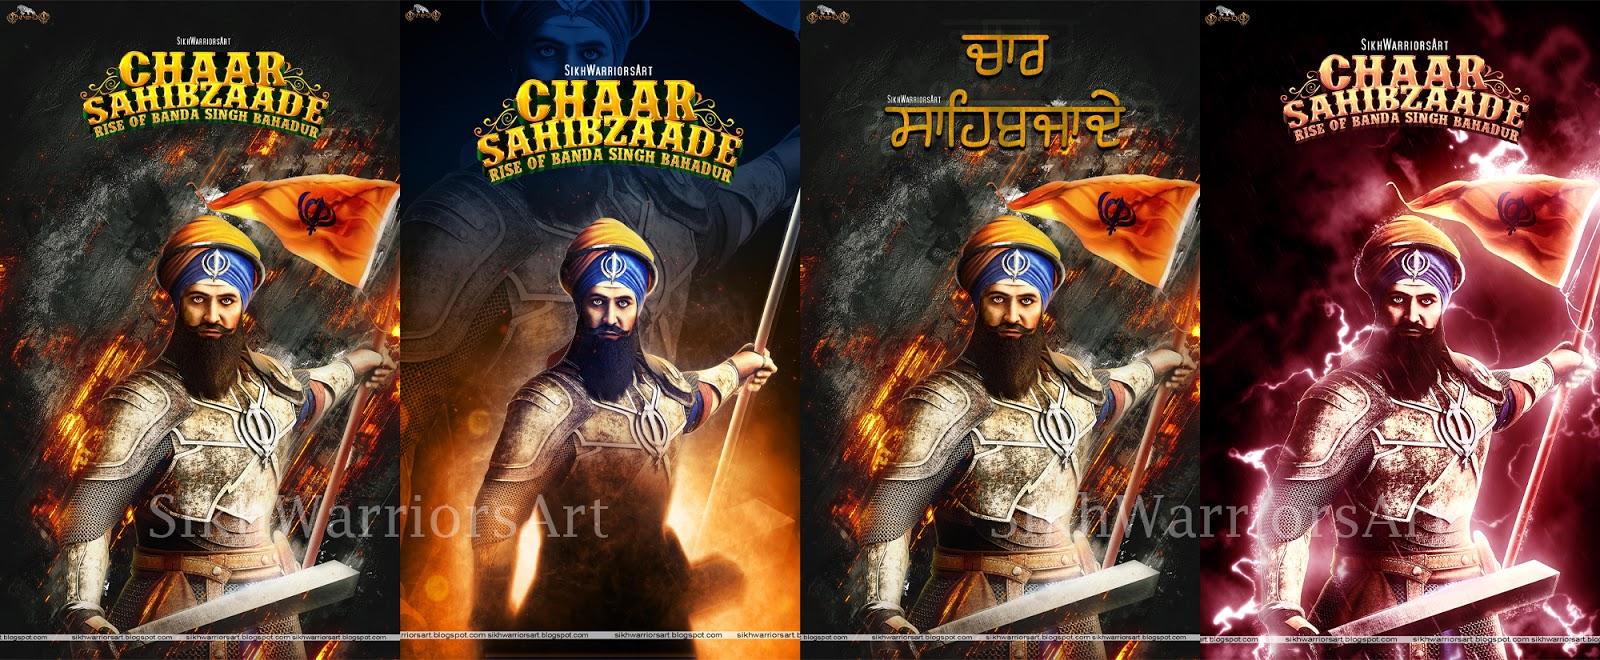 Arsh 3d Wallpaper Chaar Sahibzaade Rise Of Banda Singh Bahadur